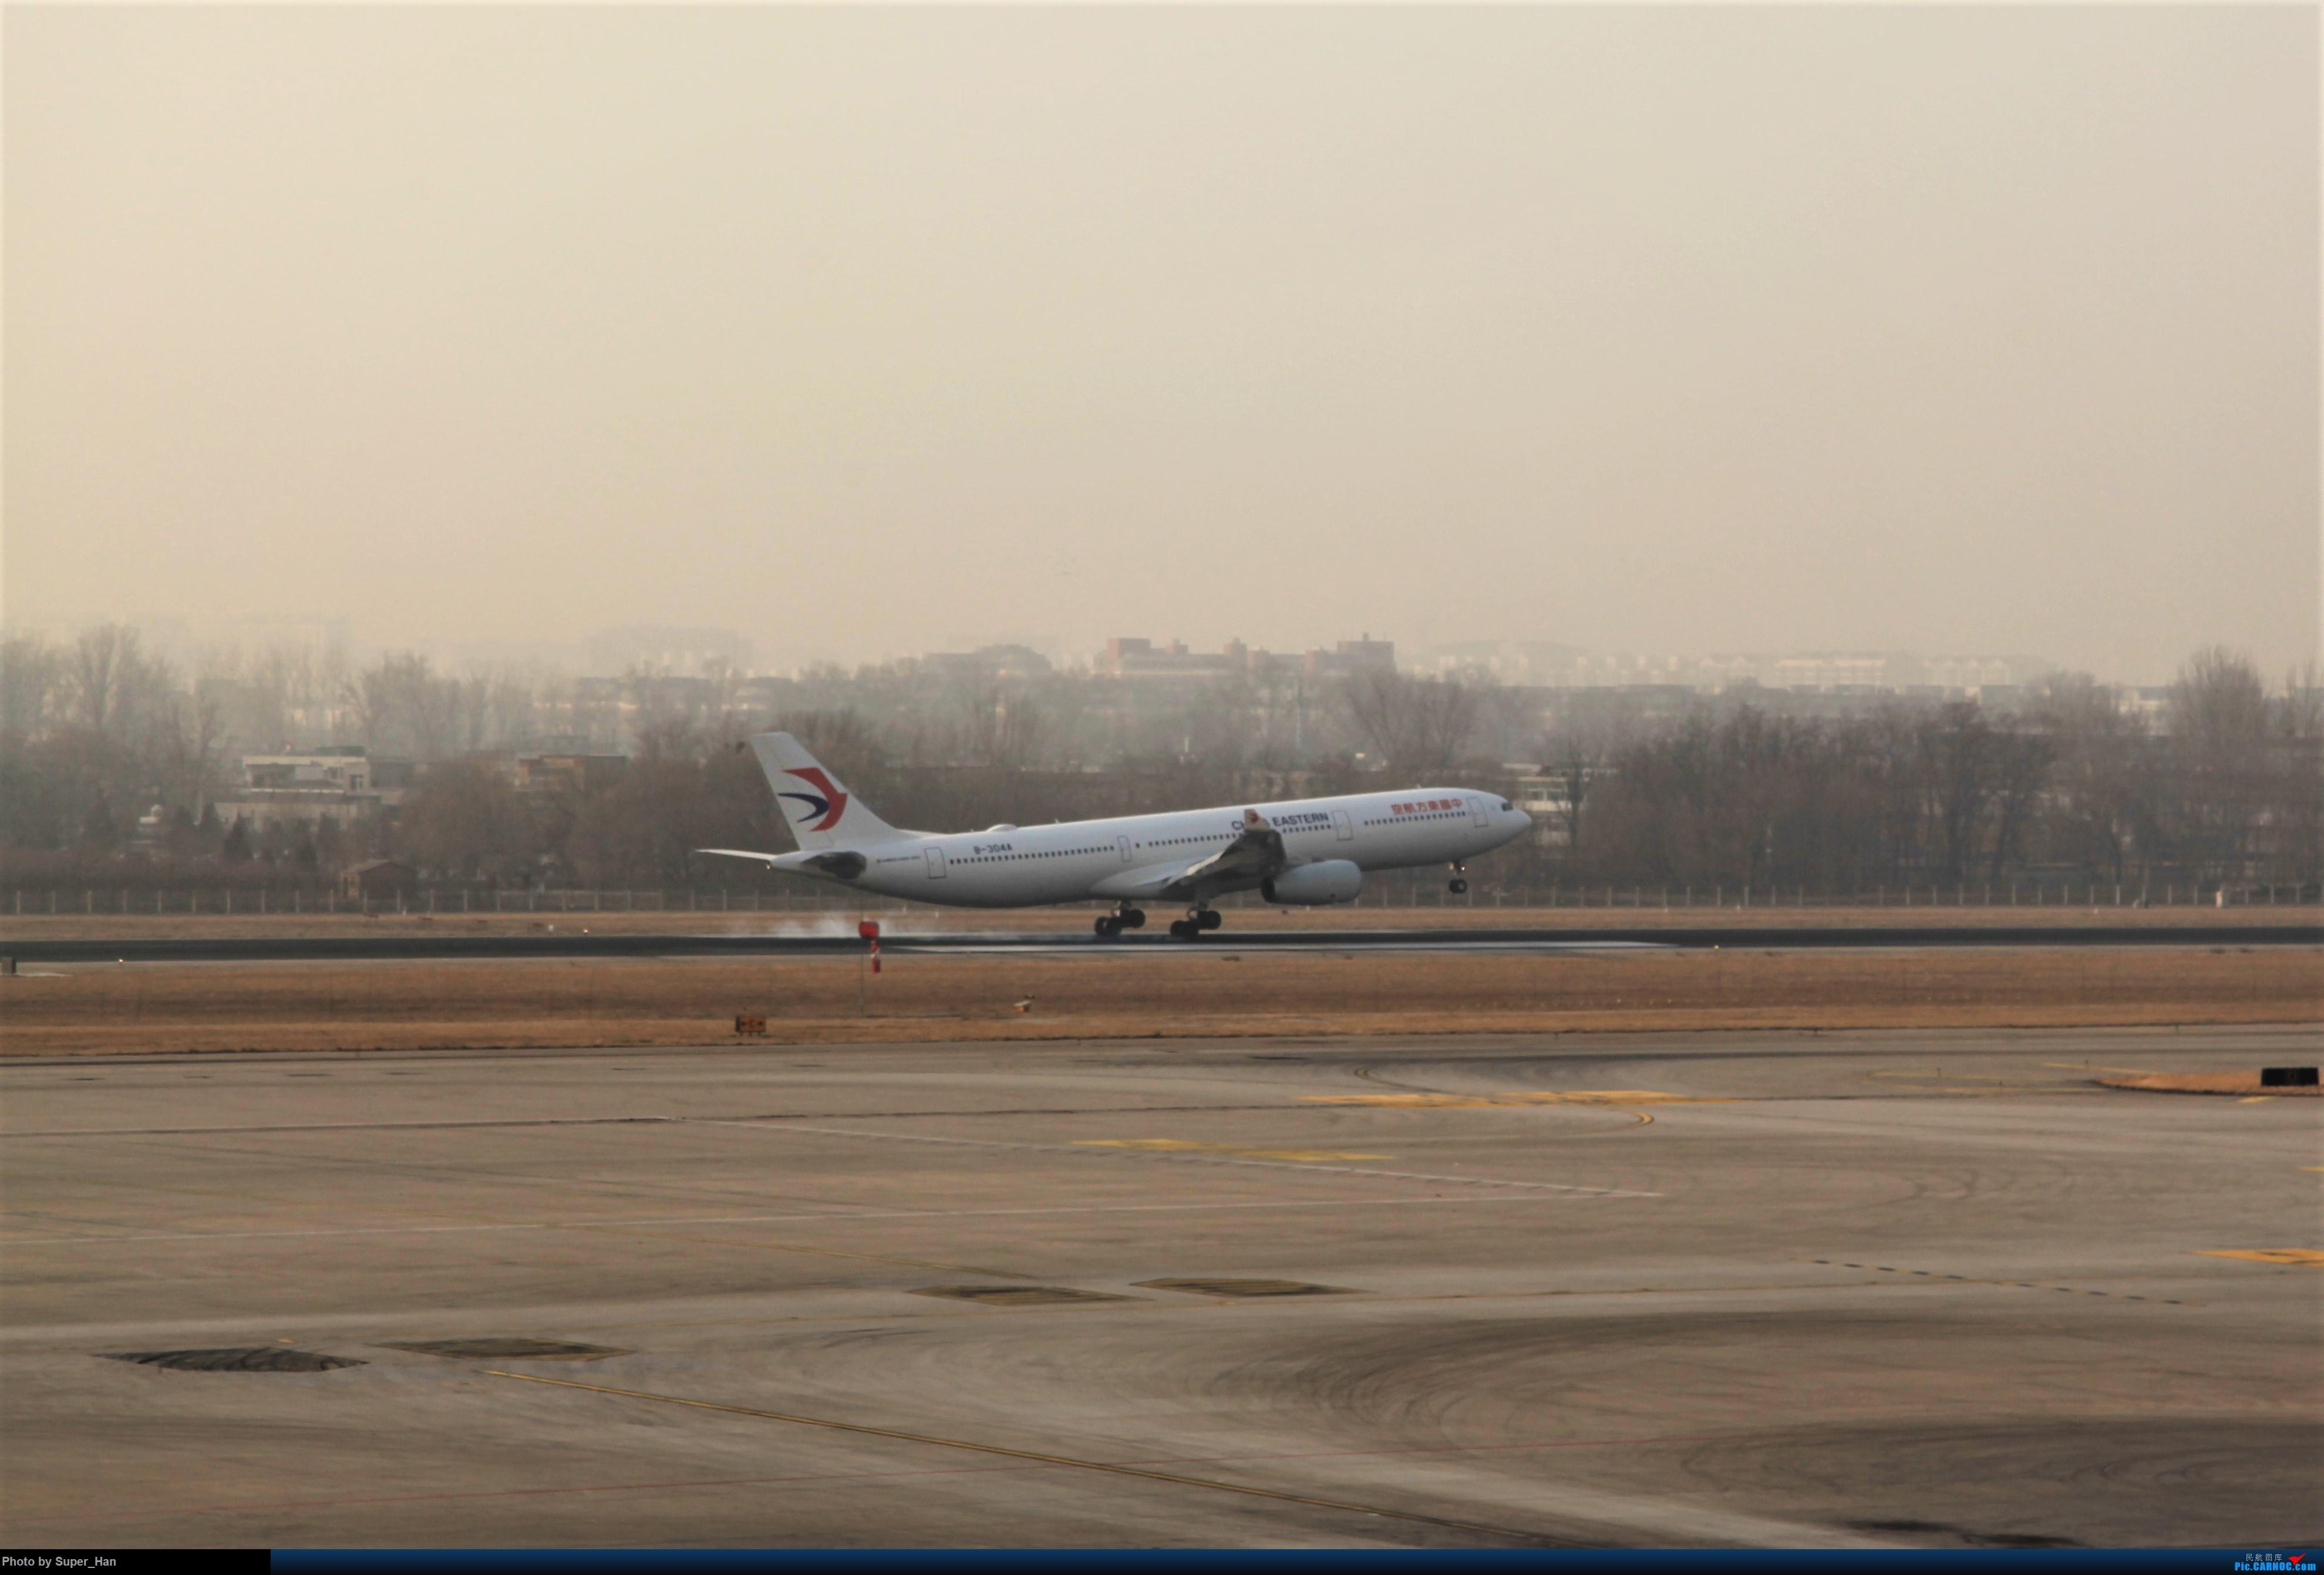 Re:[原创]2019虹桥出发飞北京第一拍 AIRBUS A330-300 B-304A 中国北京首都国际机场